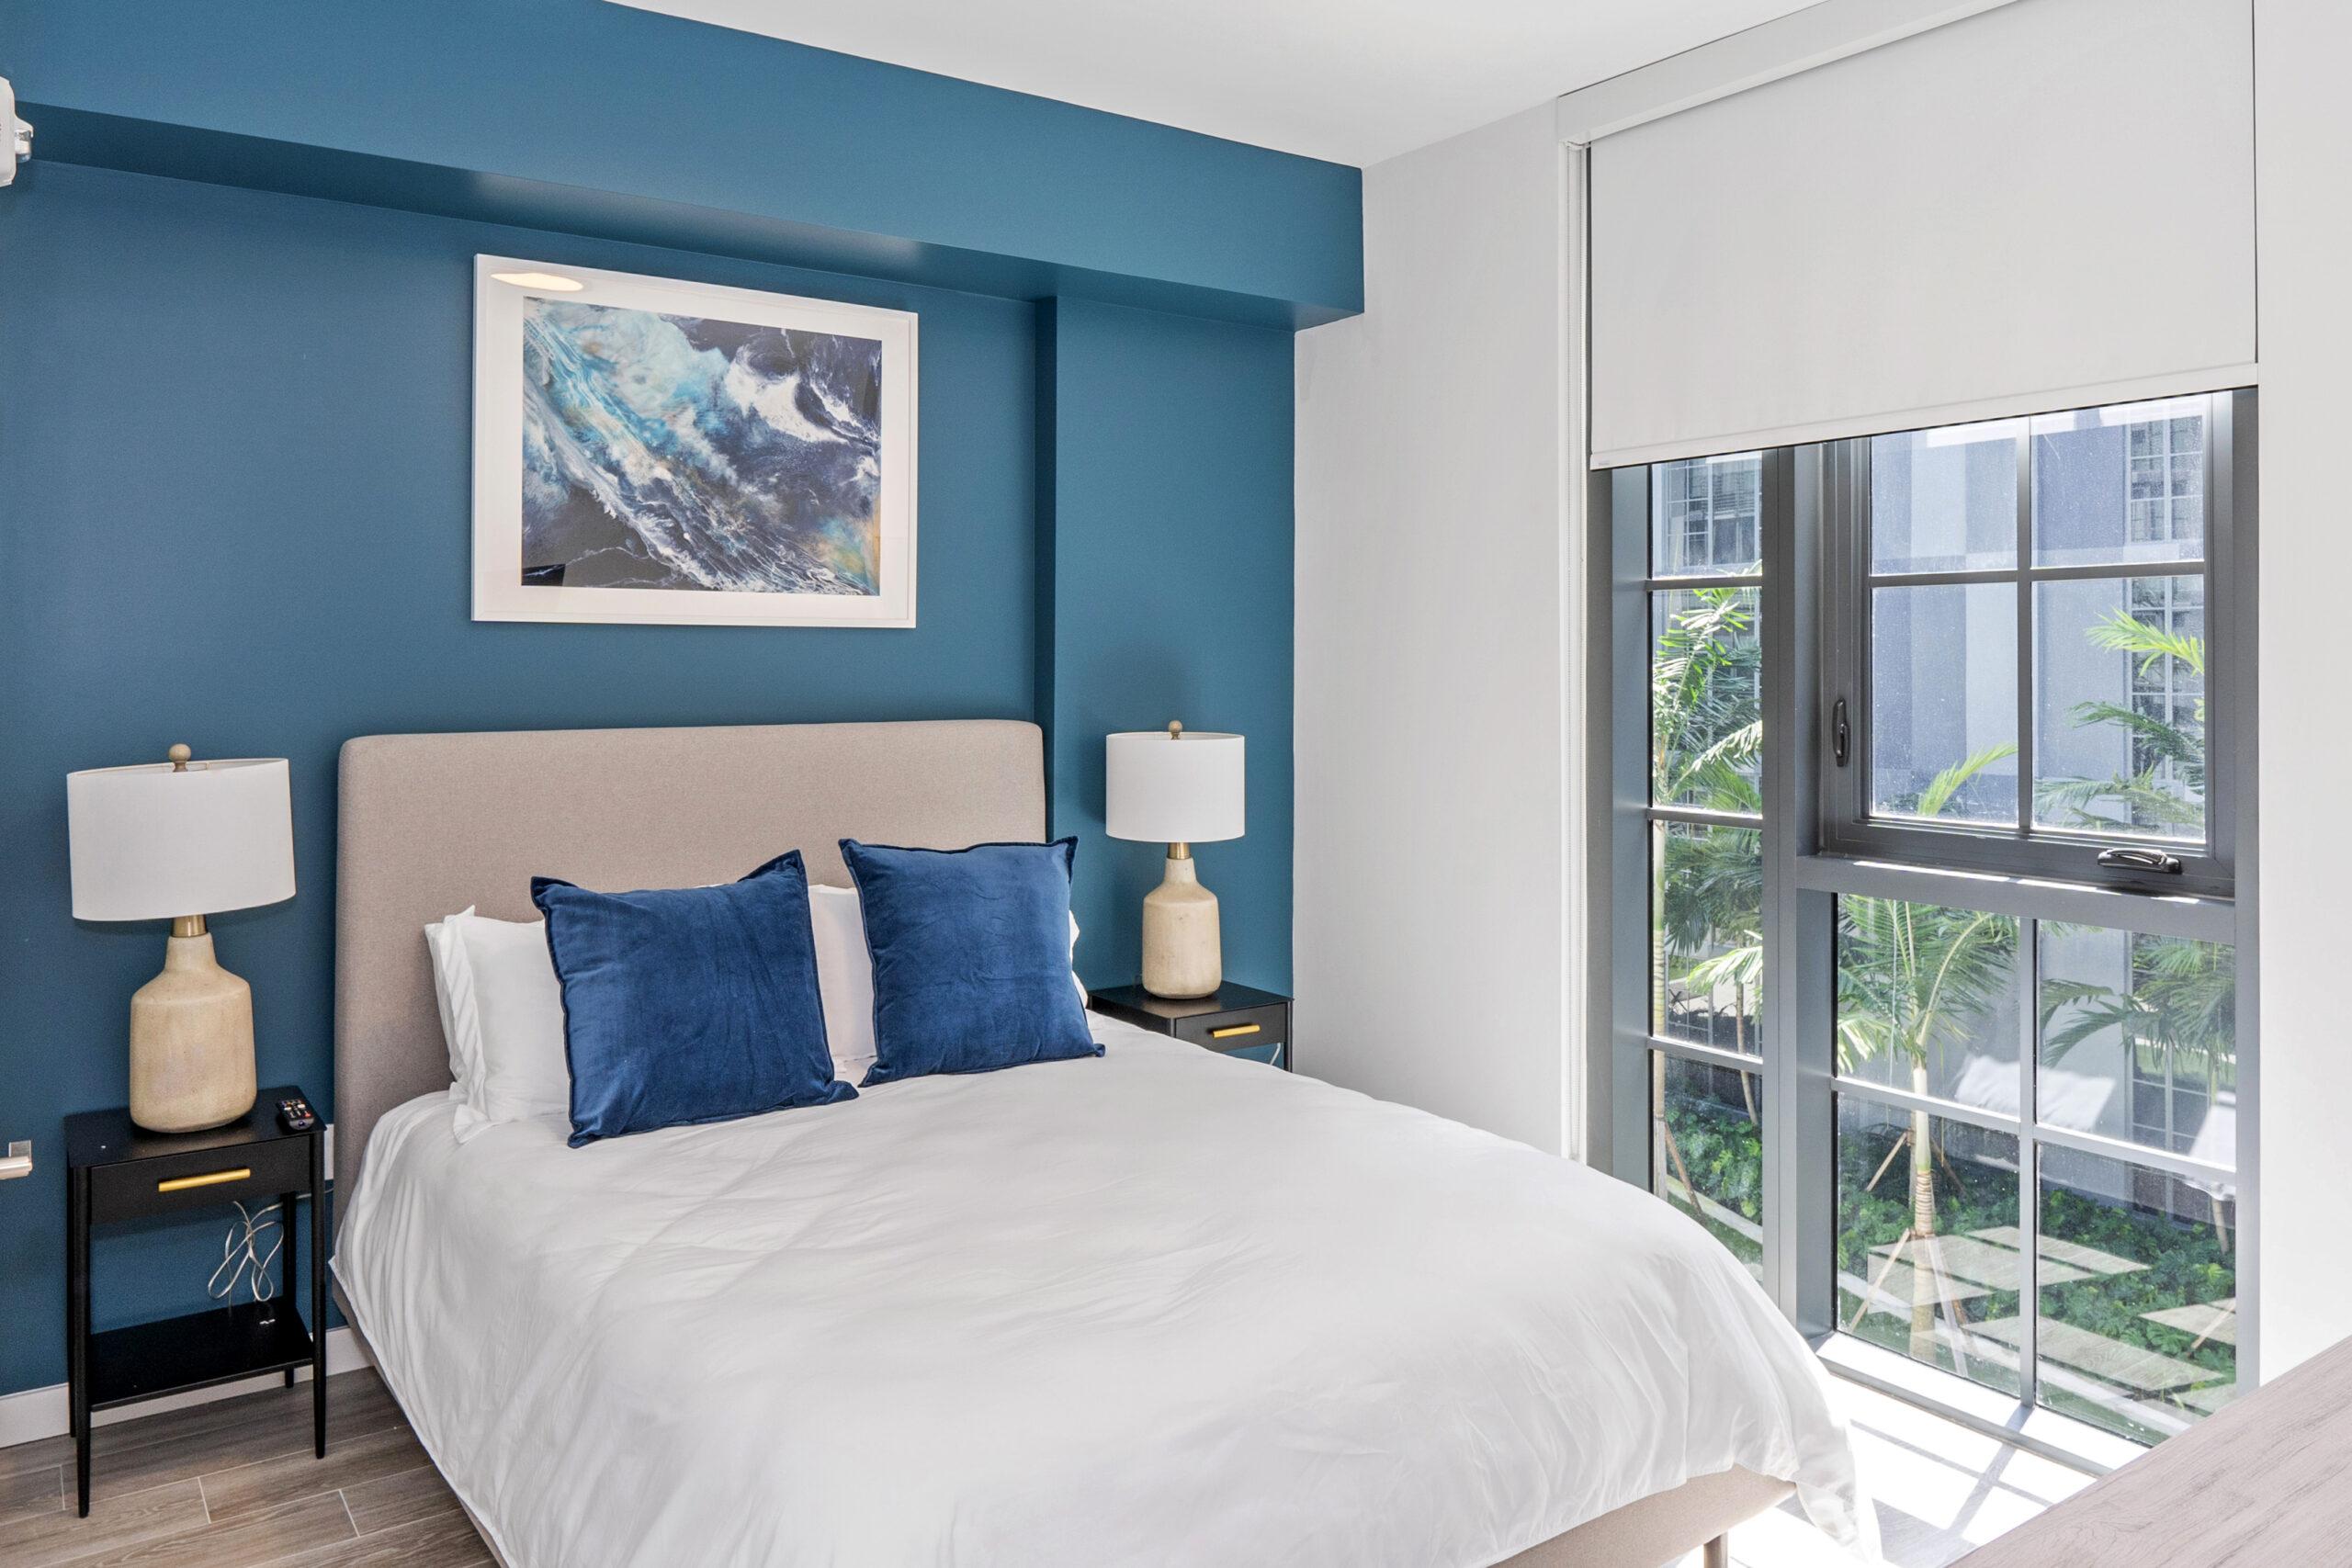 A Landing apartment in Miami